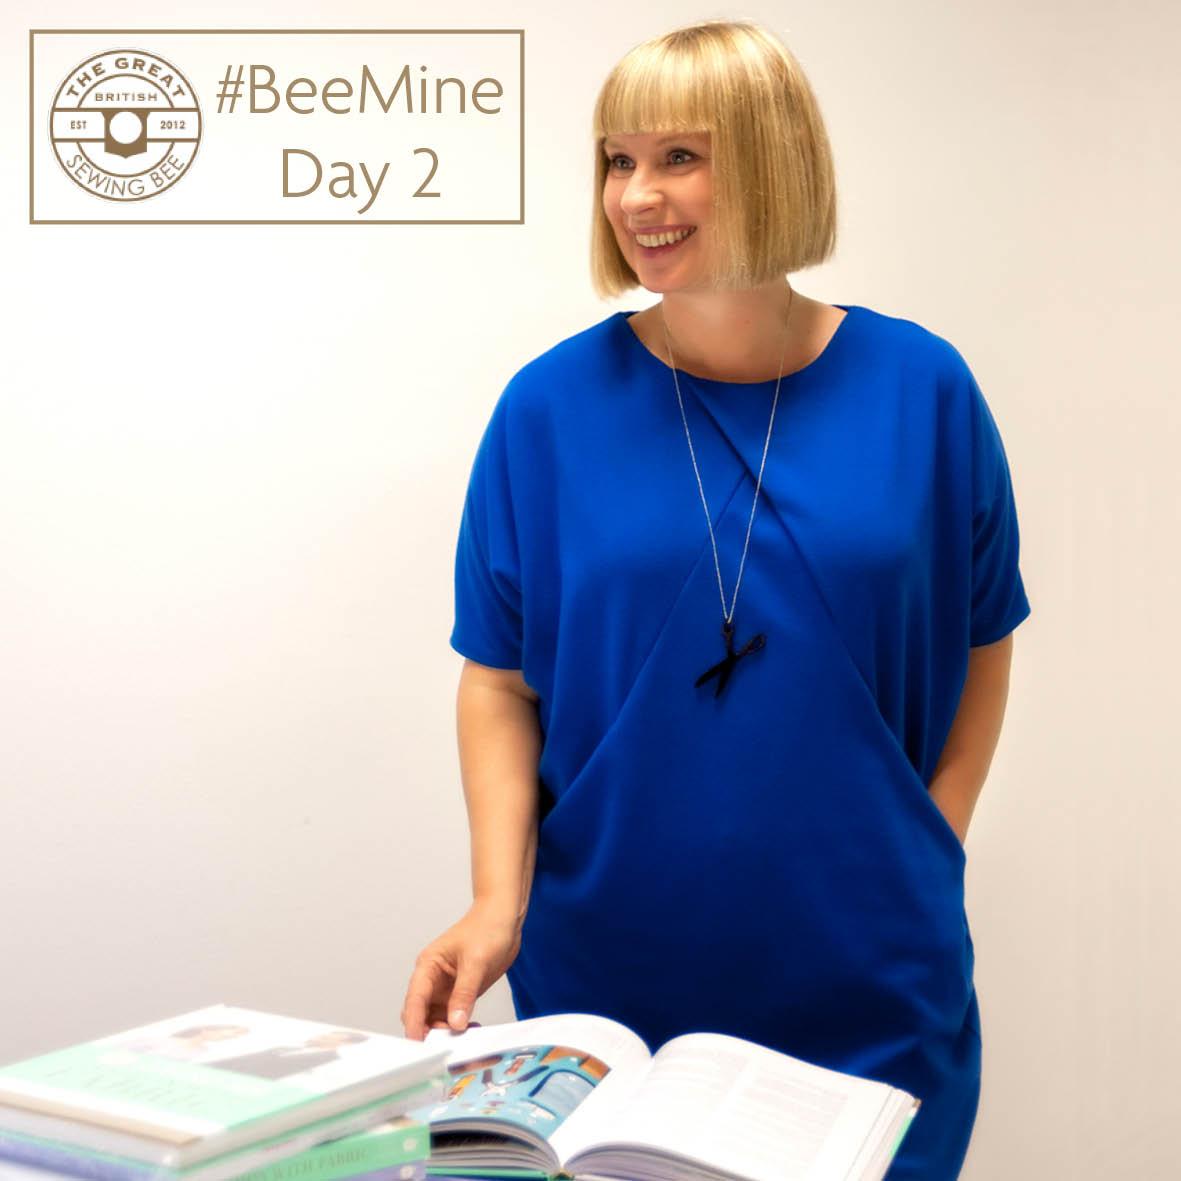 Day 2 #BeeMine- my 30 day blog challenge